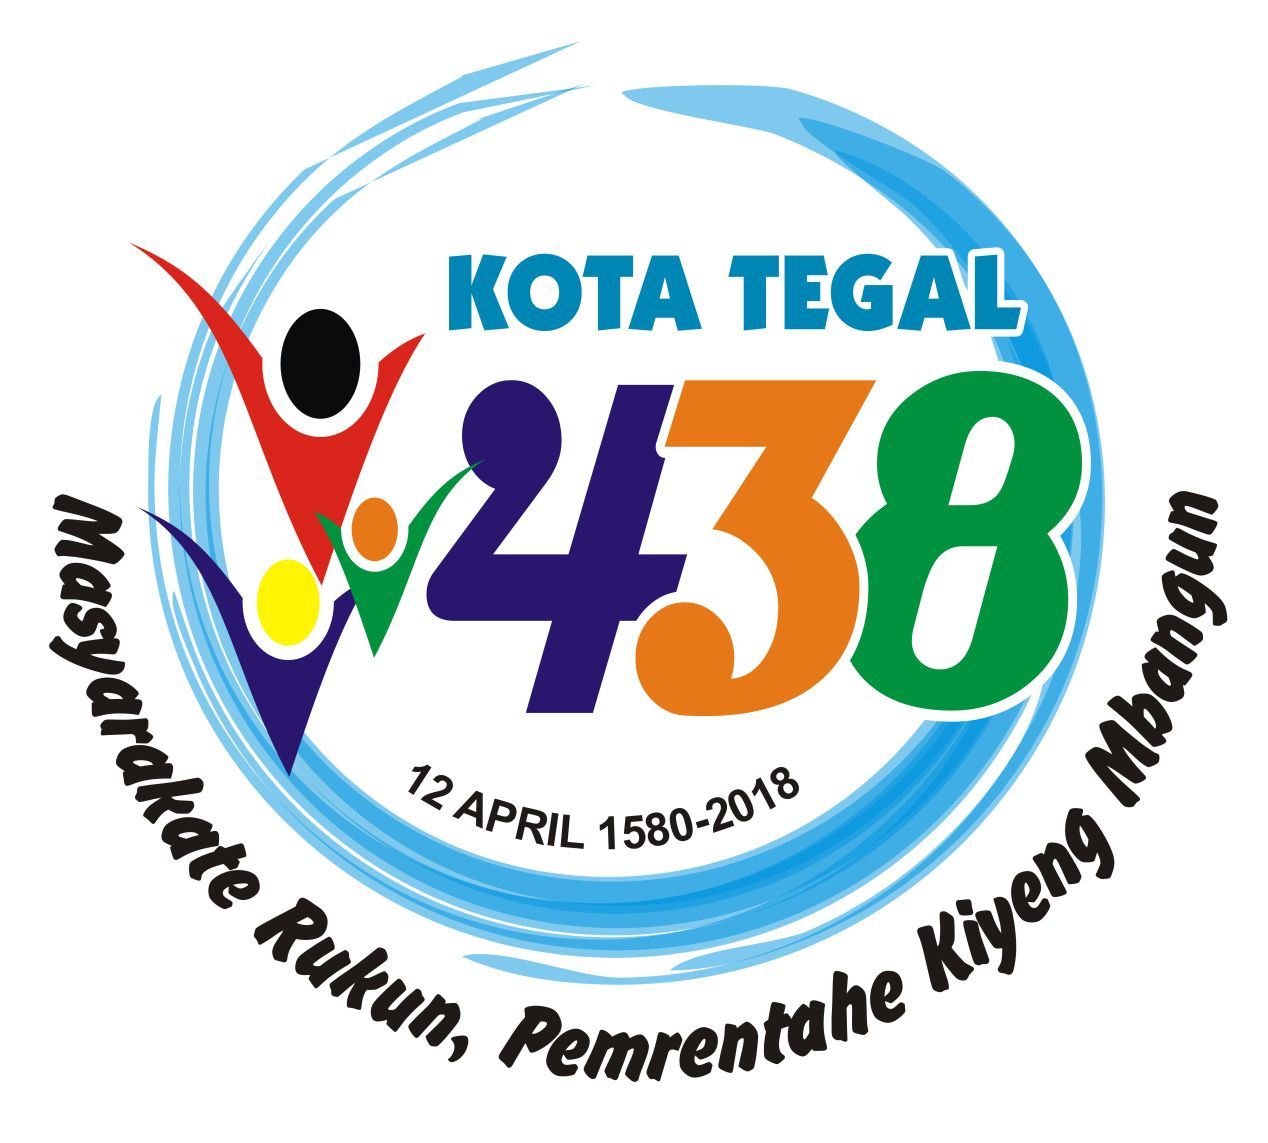 Rangkaian Kegiatan Hari Jadi Kota Tegal Ke 438 Http Wartabahari Com